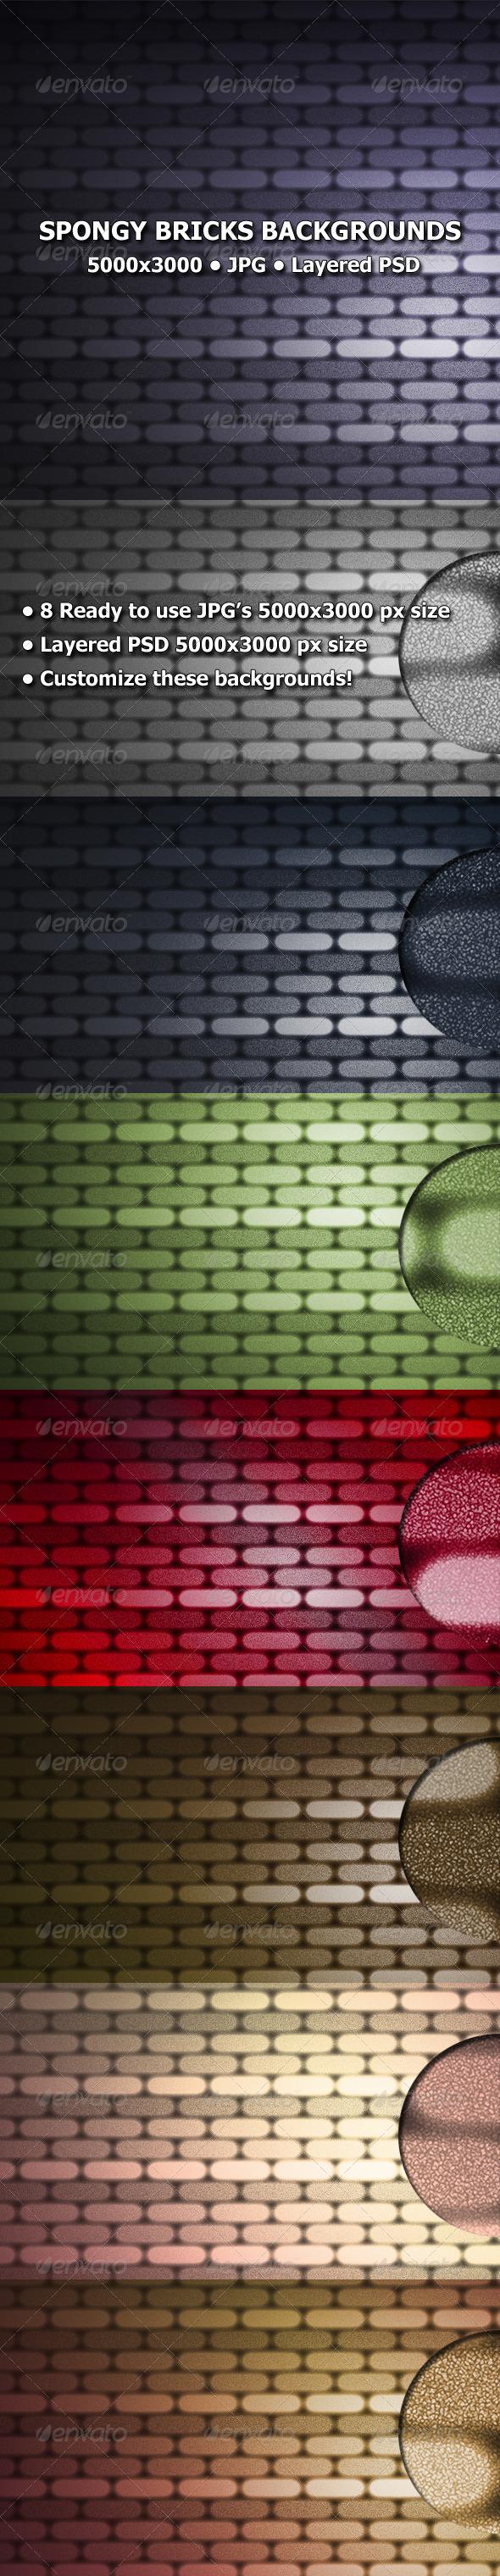 GraphicRiver Spongy Bricks Backgrounds 8343653